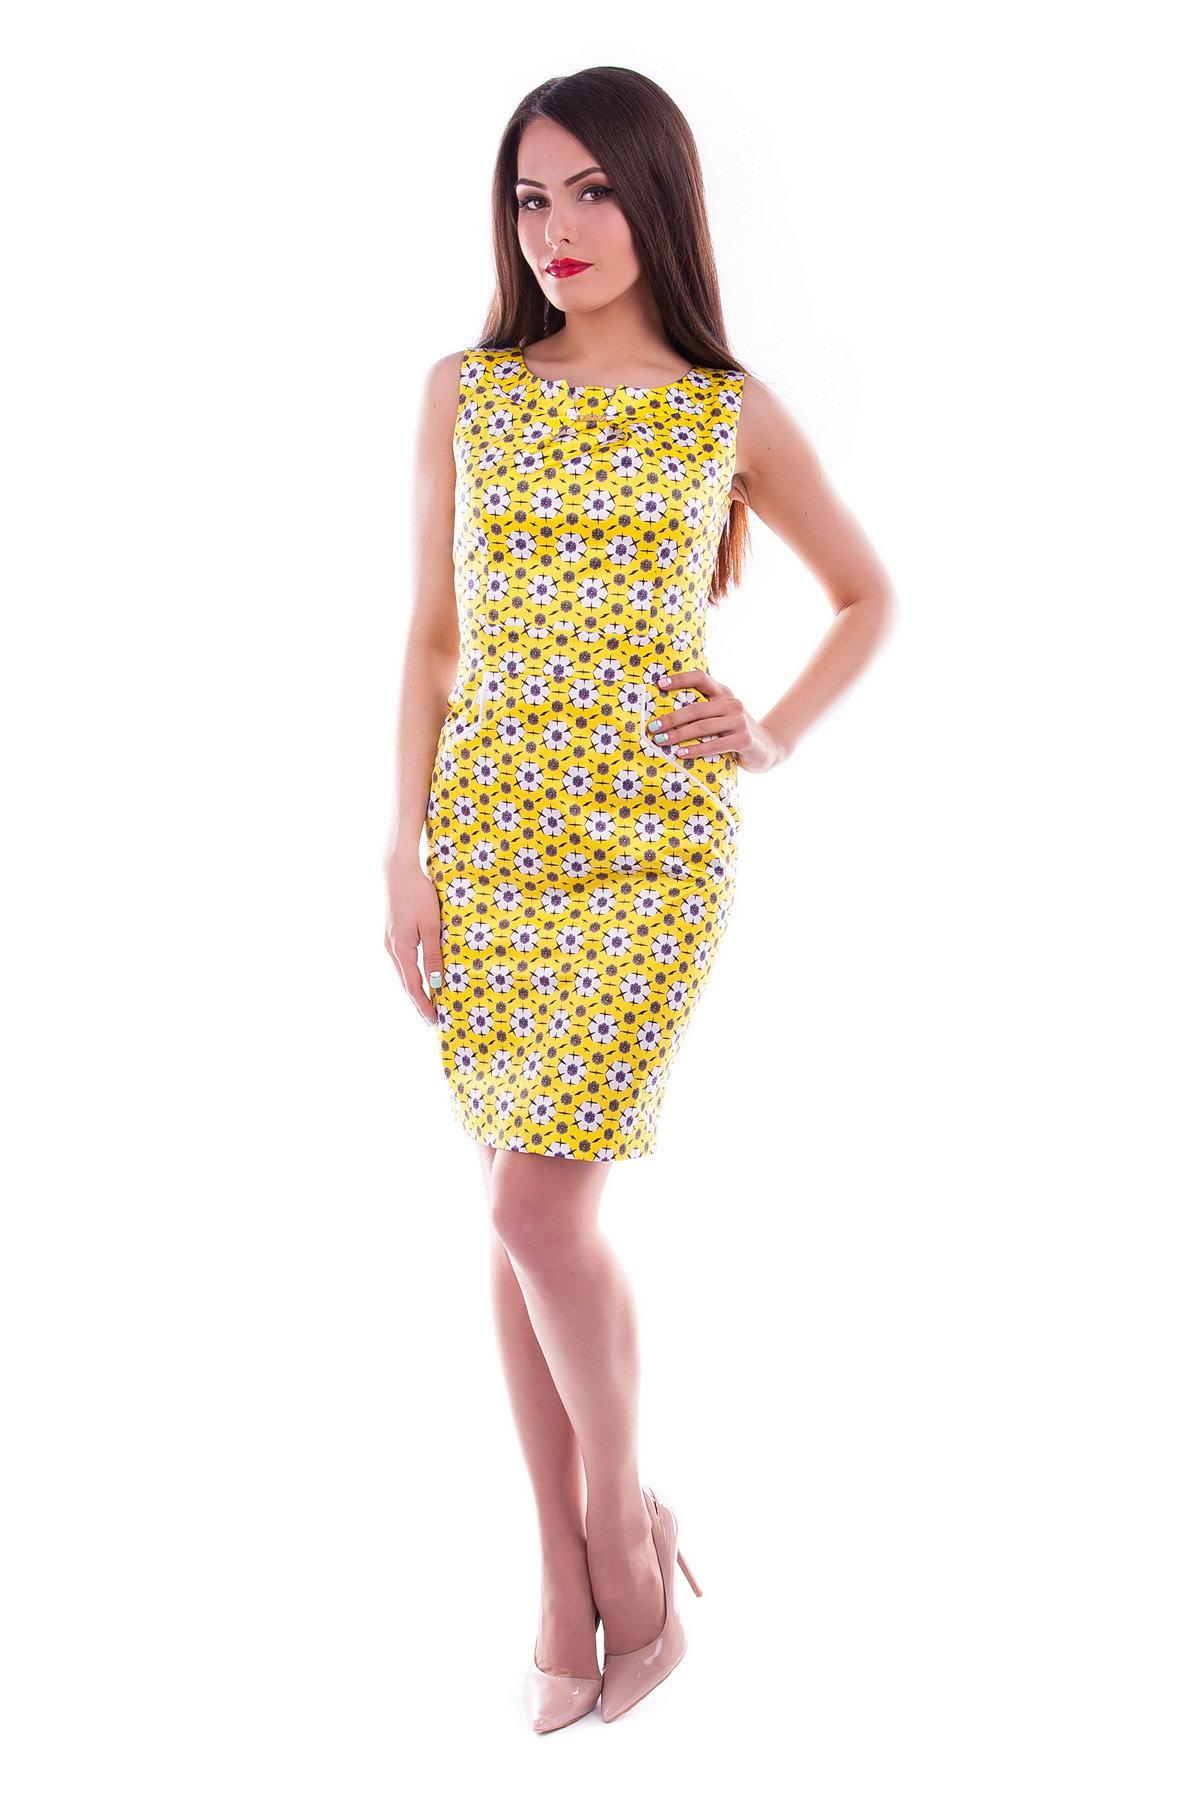 Коктейльное платье оптом от Modus Платье Шик атлас коттон